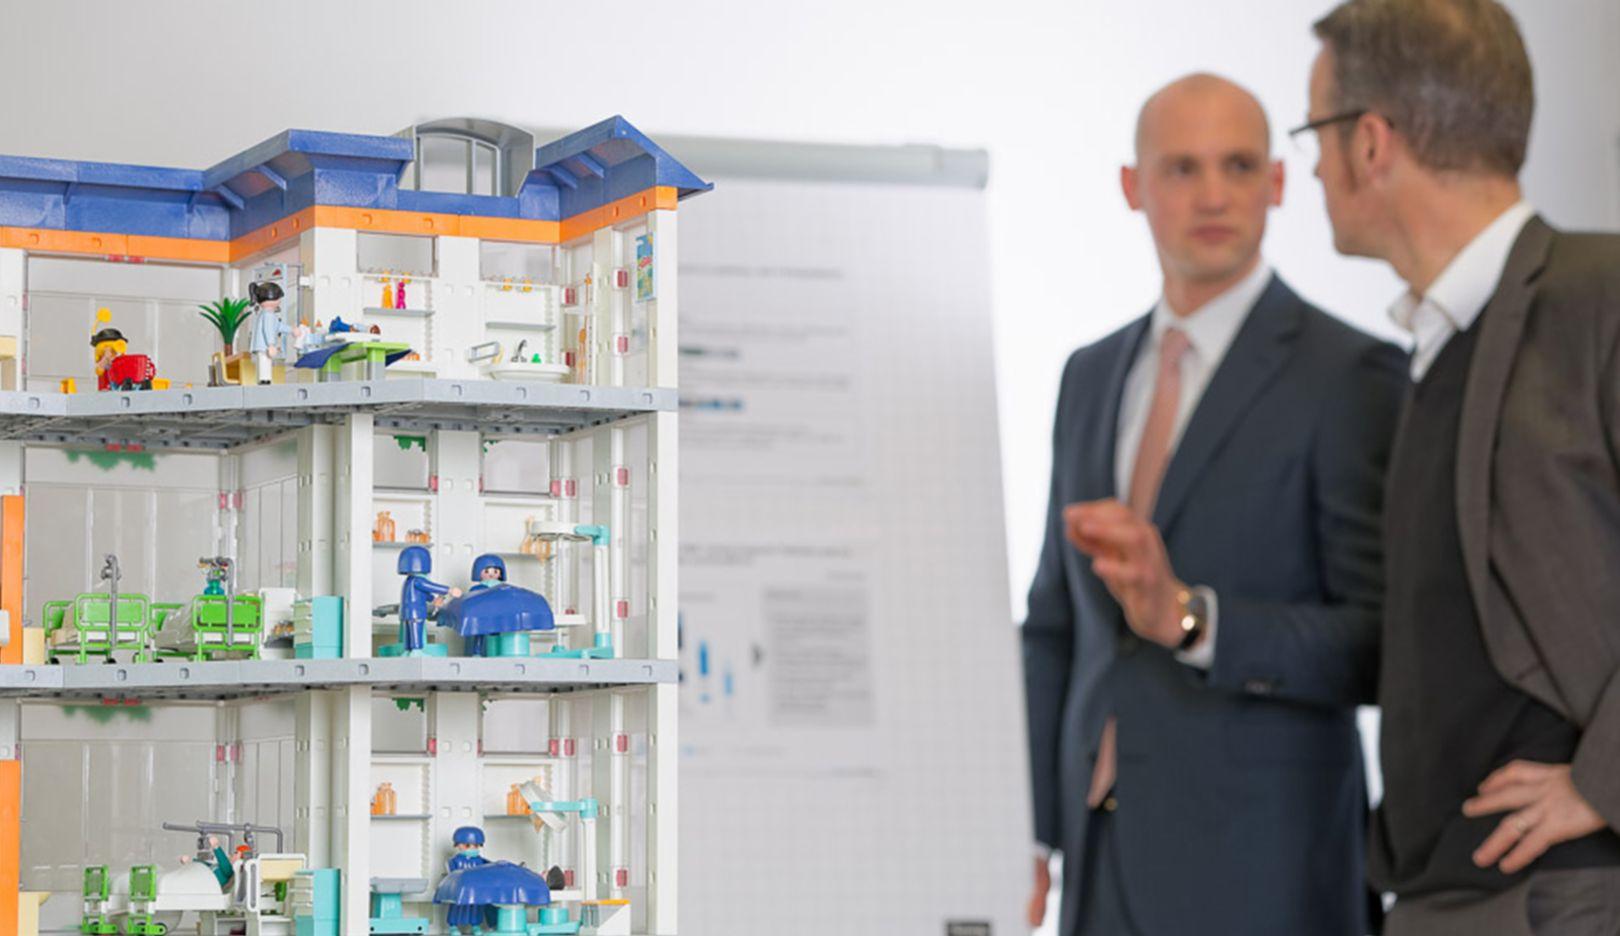 2016, Porsche Consulting GmbH